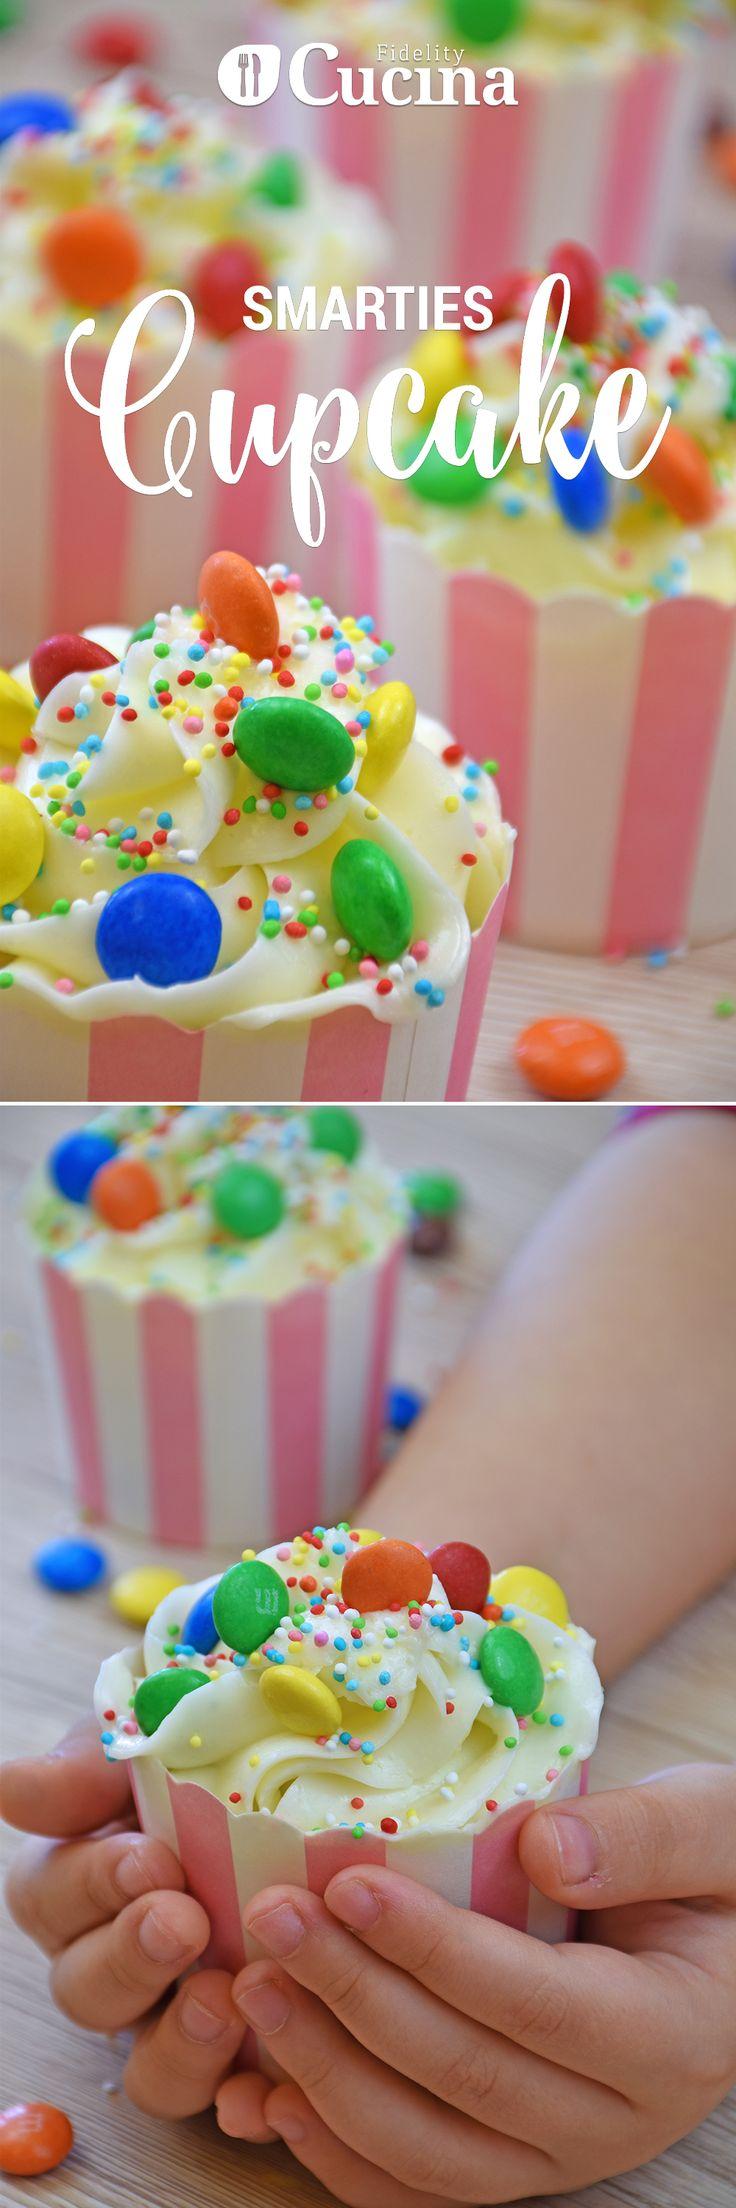 25 Best Ideas About Smarties Cake On Pinterest Inside